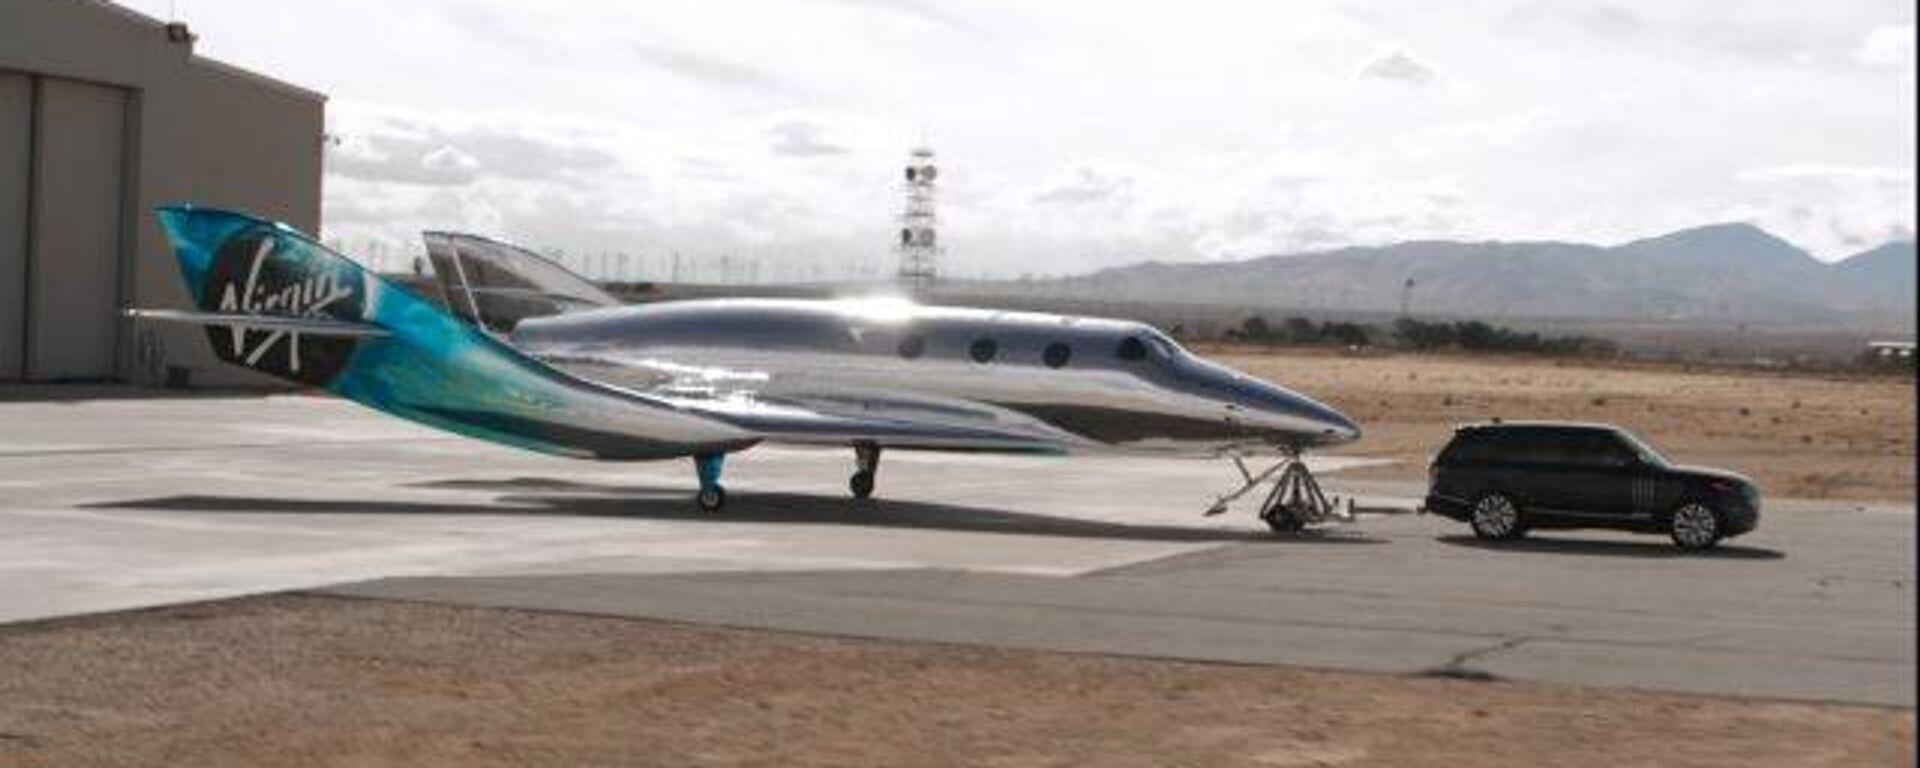 Virgin Galactic presenta la nave Imagine para turismo espacial - Sputnik Mundo, 1920, 31.03.2021